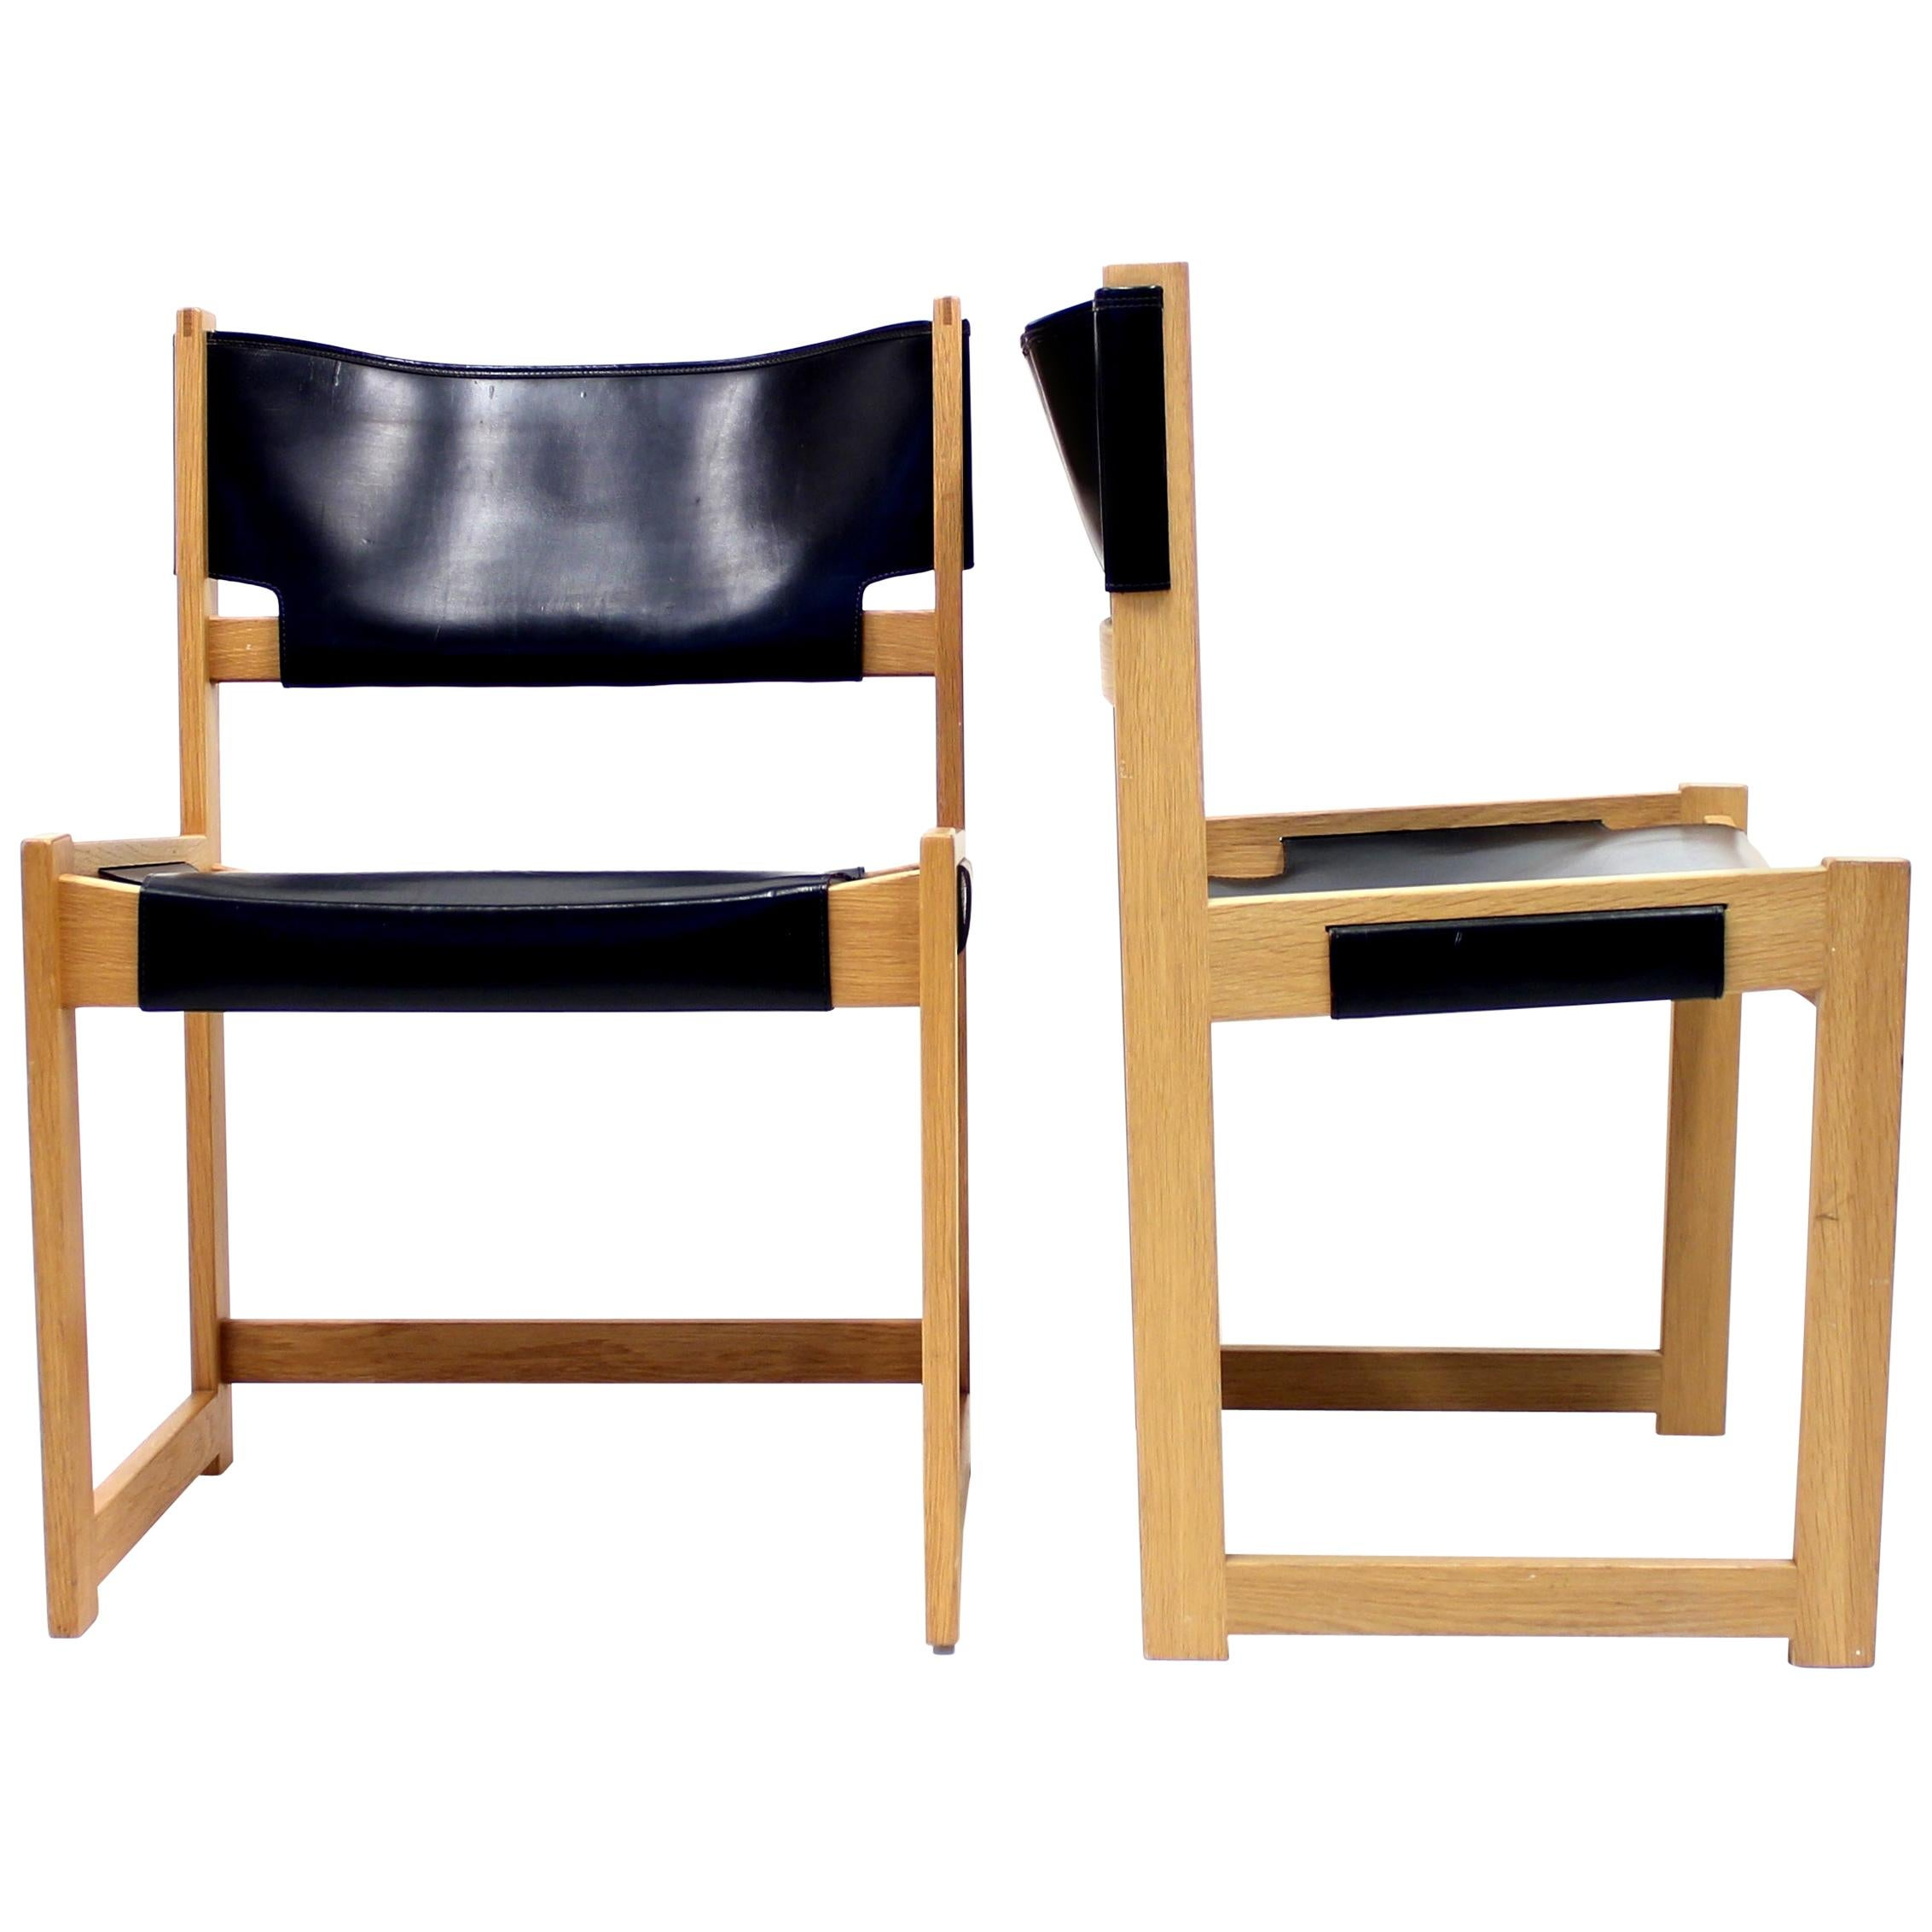 Sven Kai Larsen Chairs for Nordiska Kompaniet, Set of 2